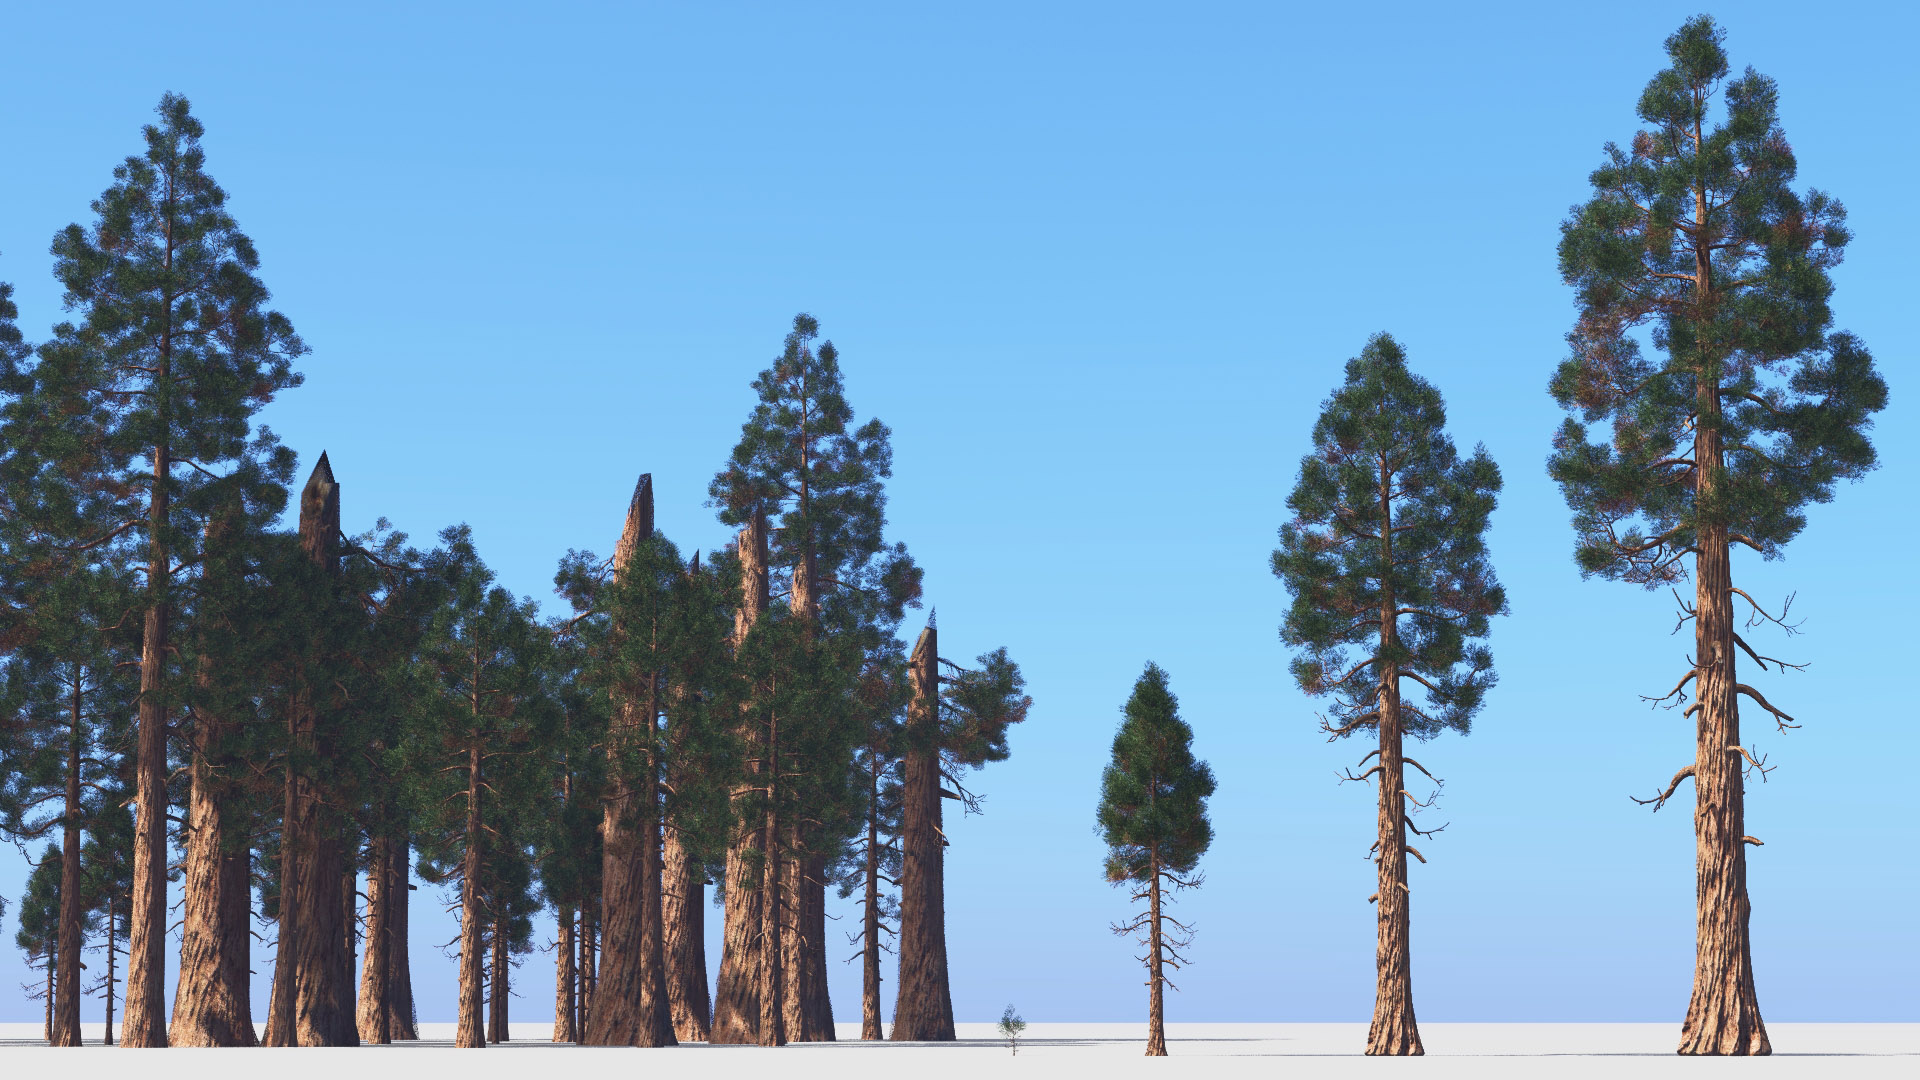 3D model of the Giant sequoia Sequoiadendron giganteum